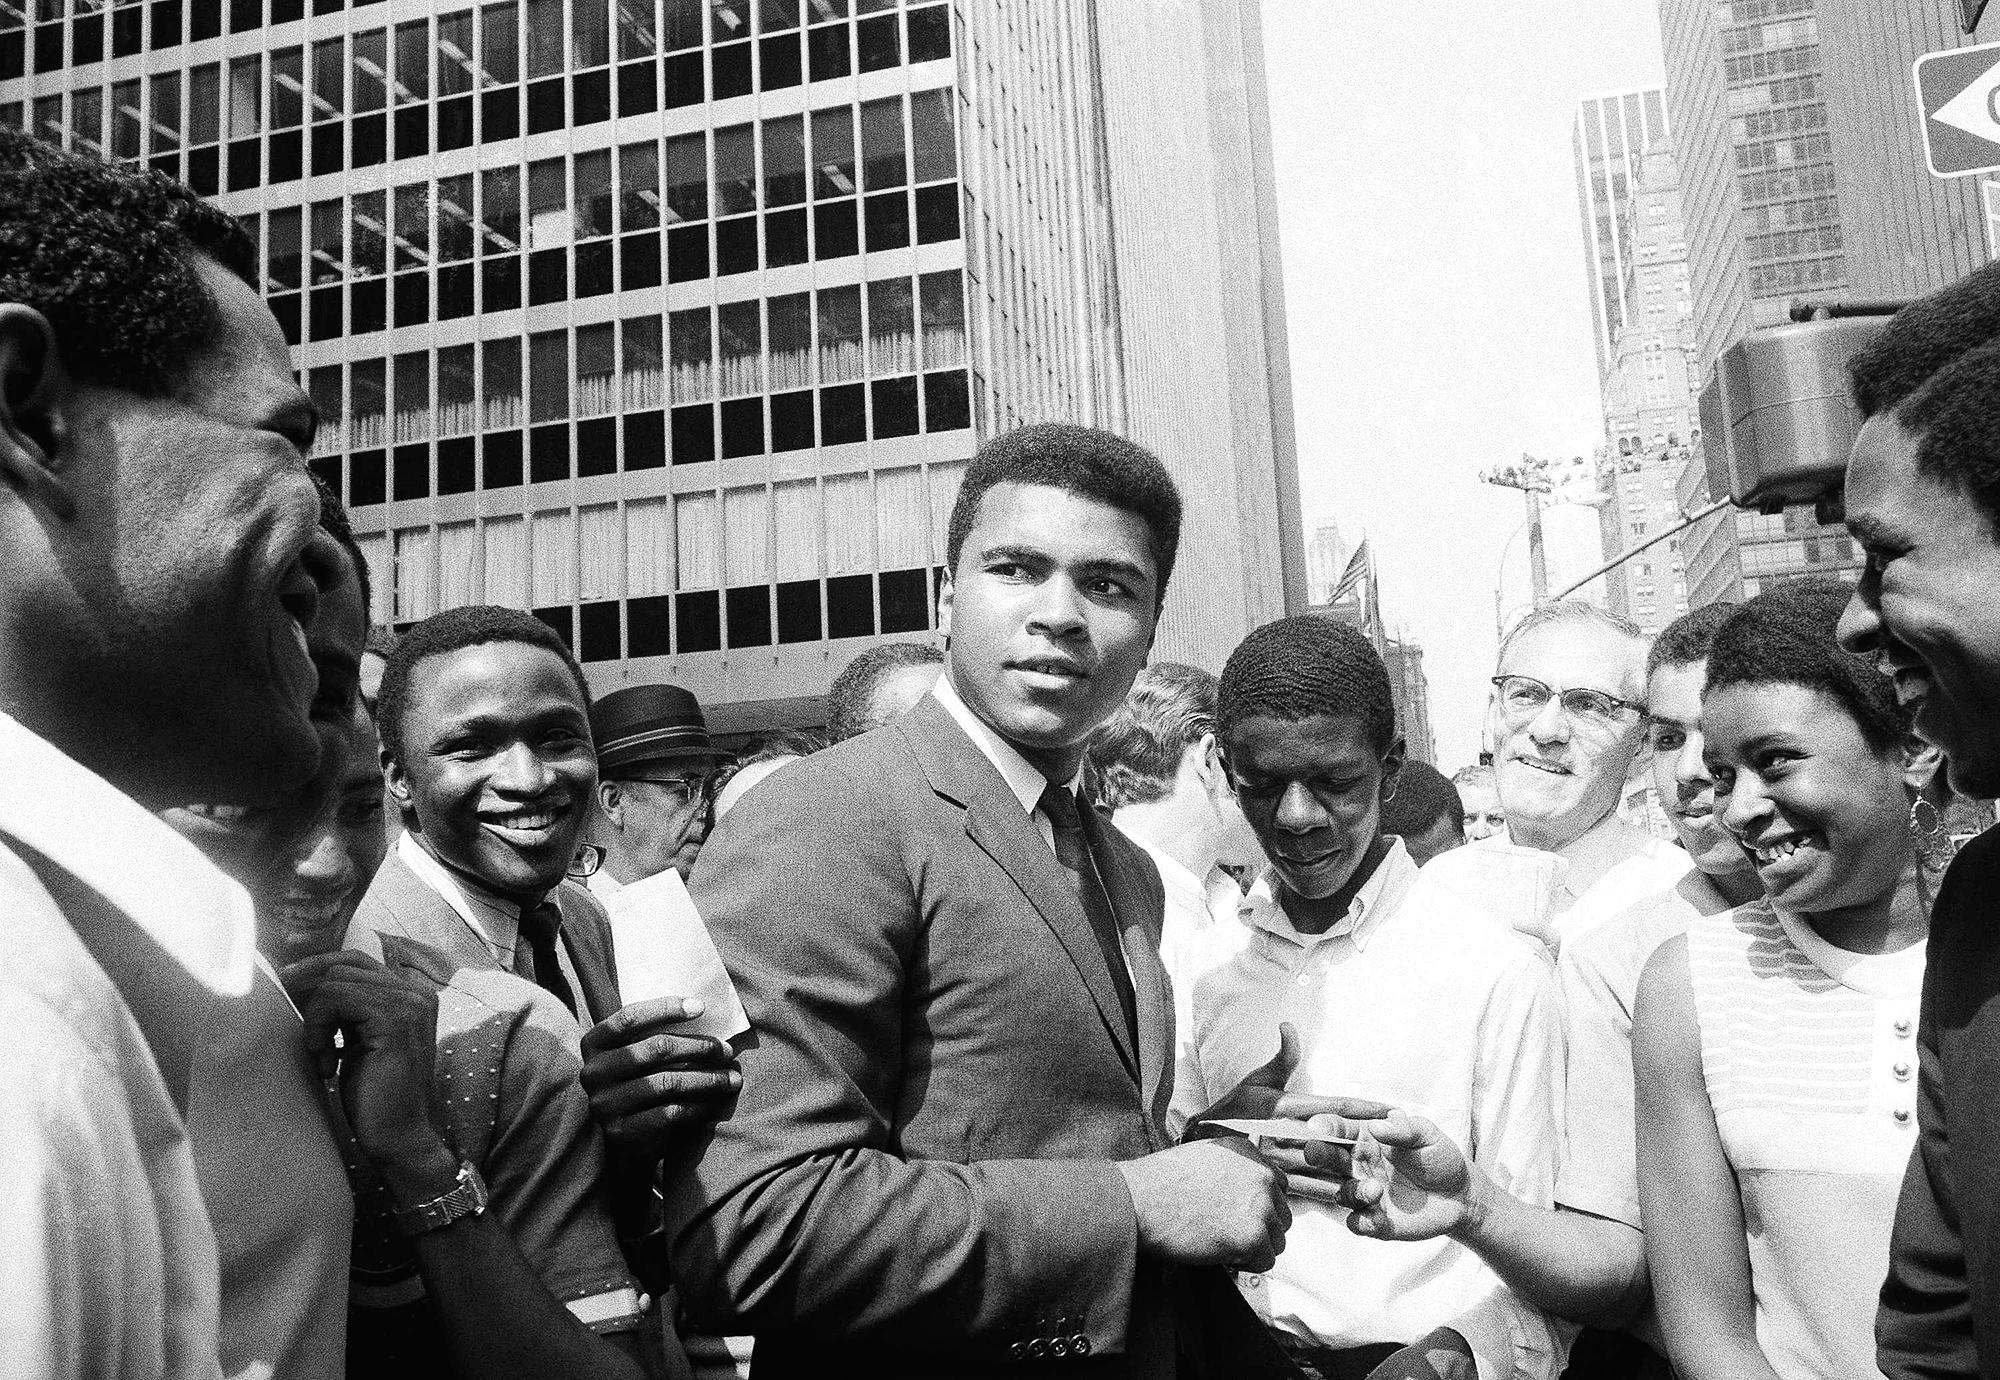 Muhammad Ali: 4 Ways He Changed America